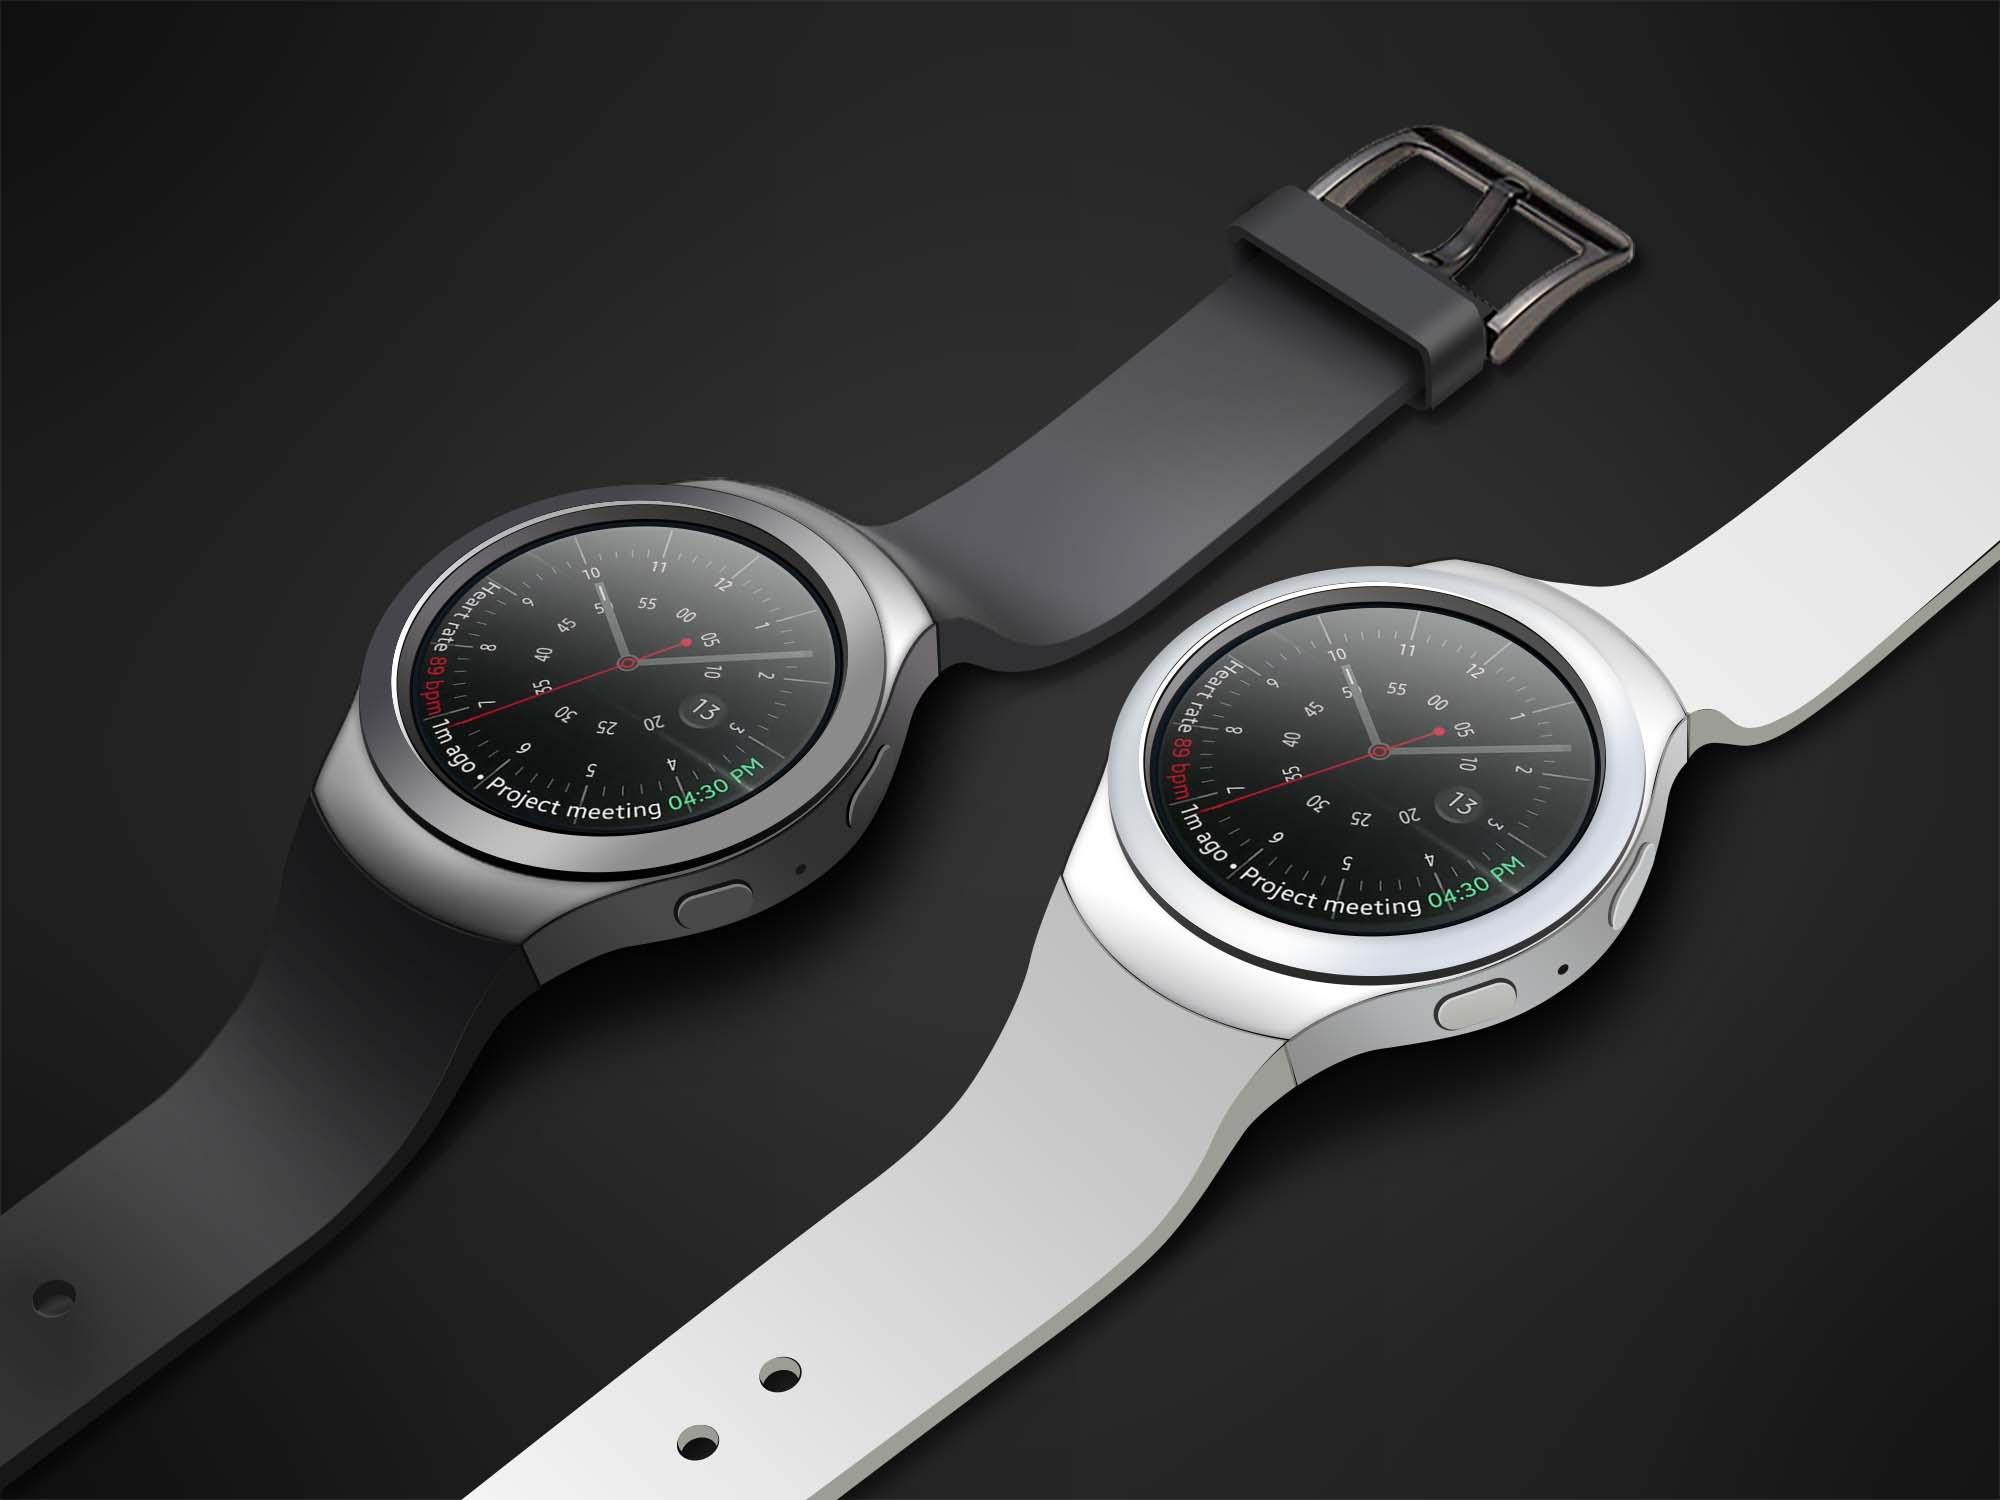 Samsung Gear S2 Watch Mockup 2